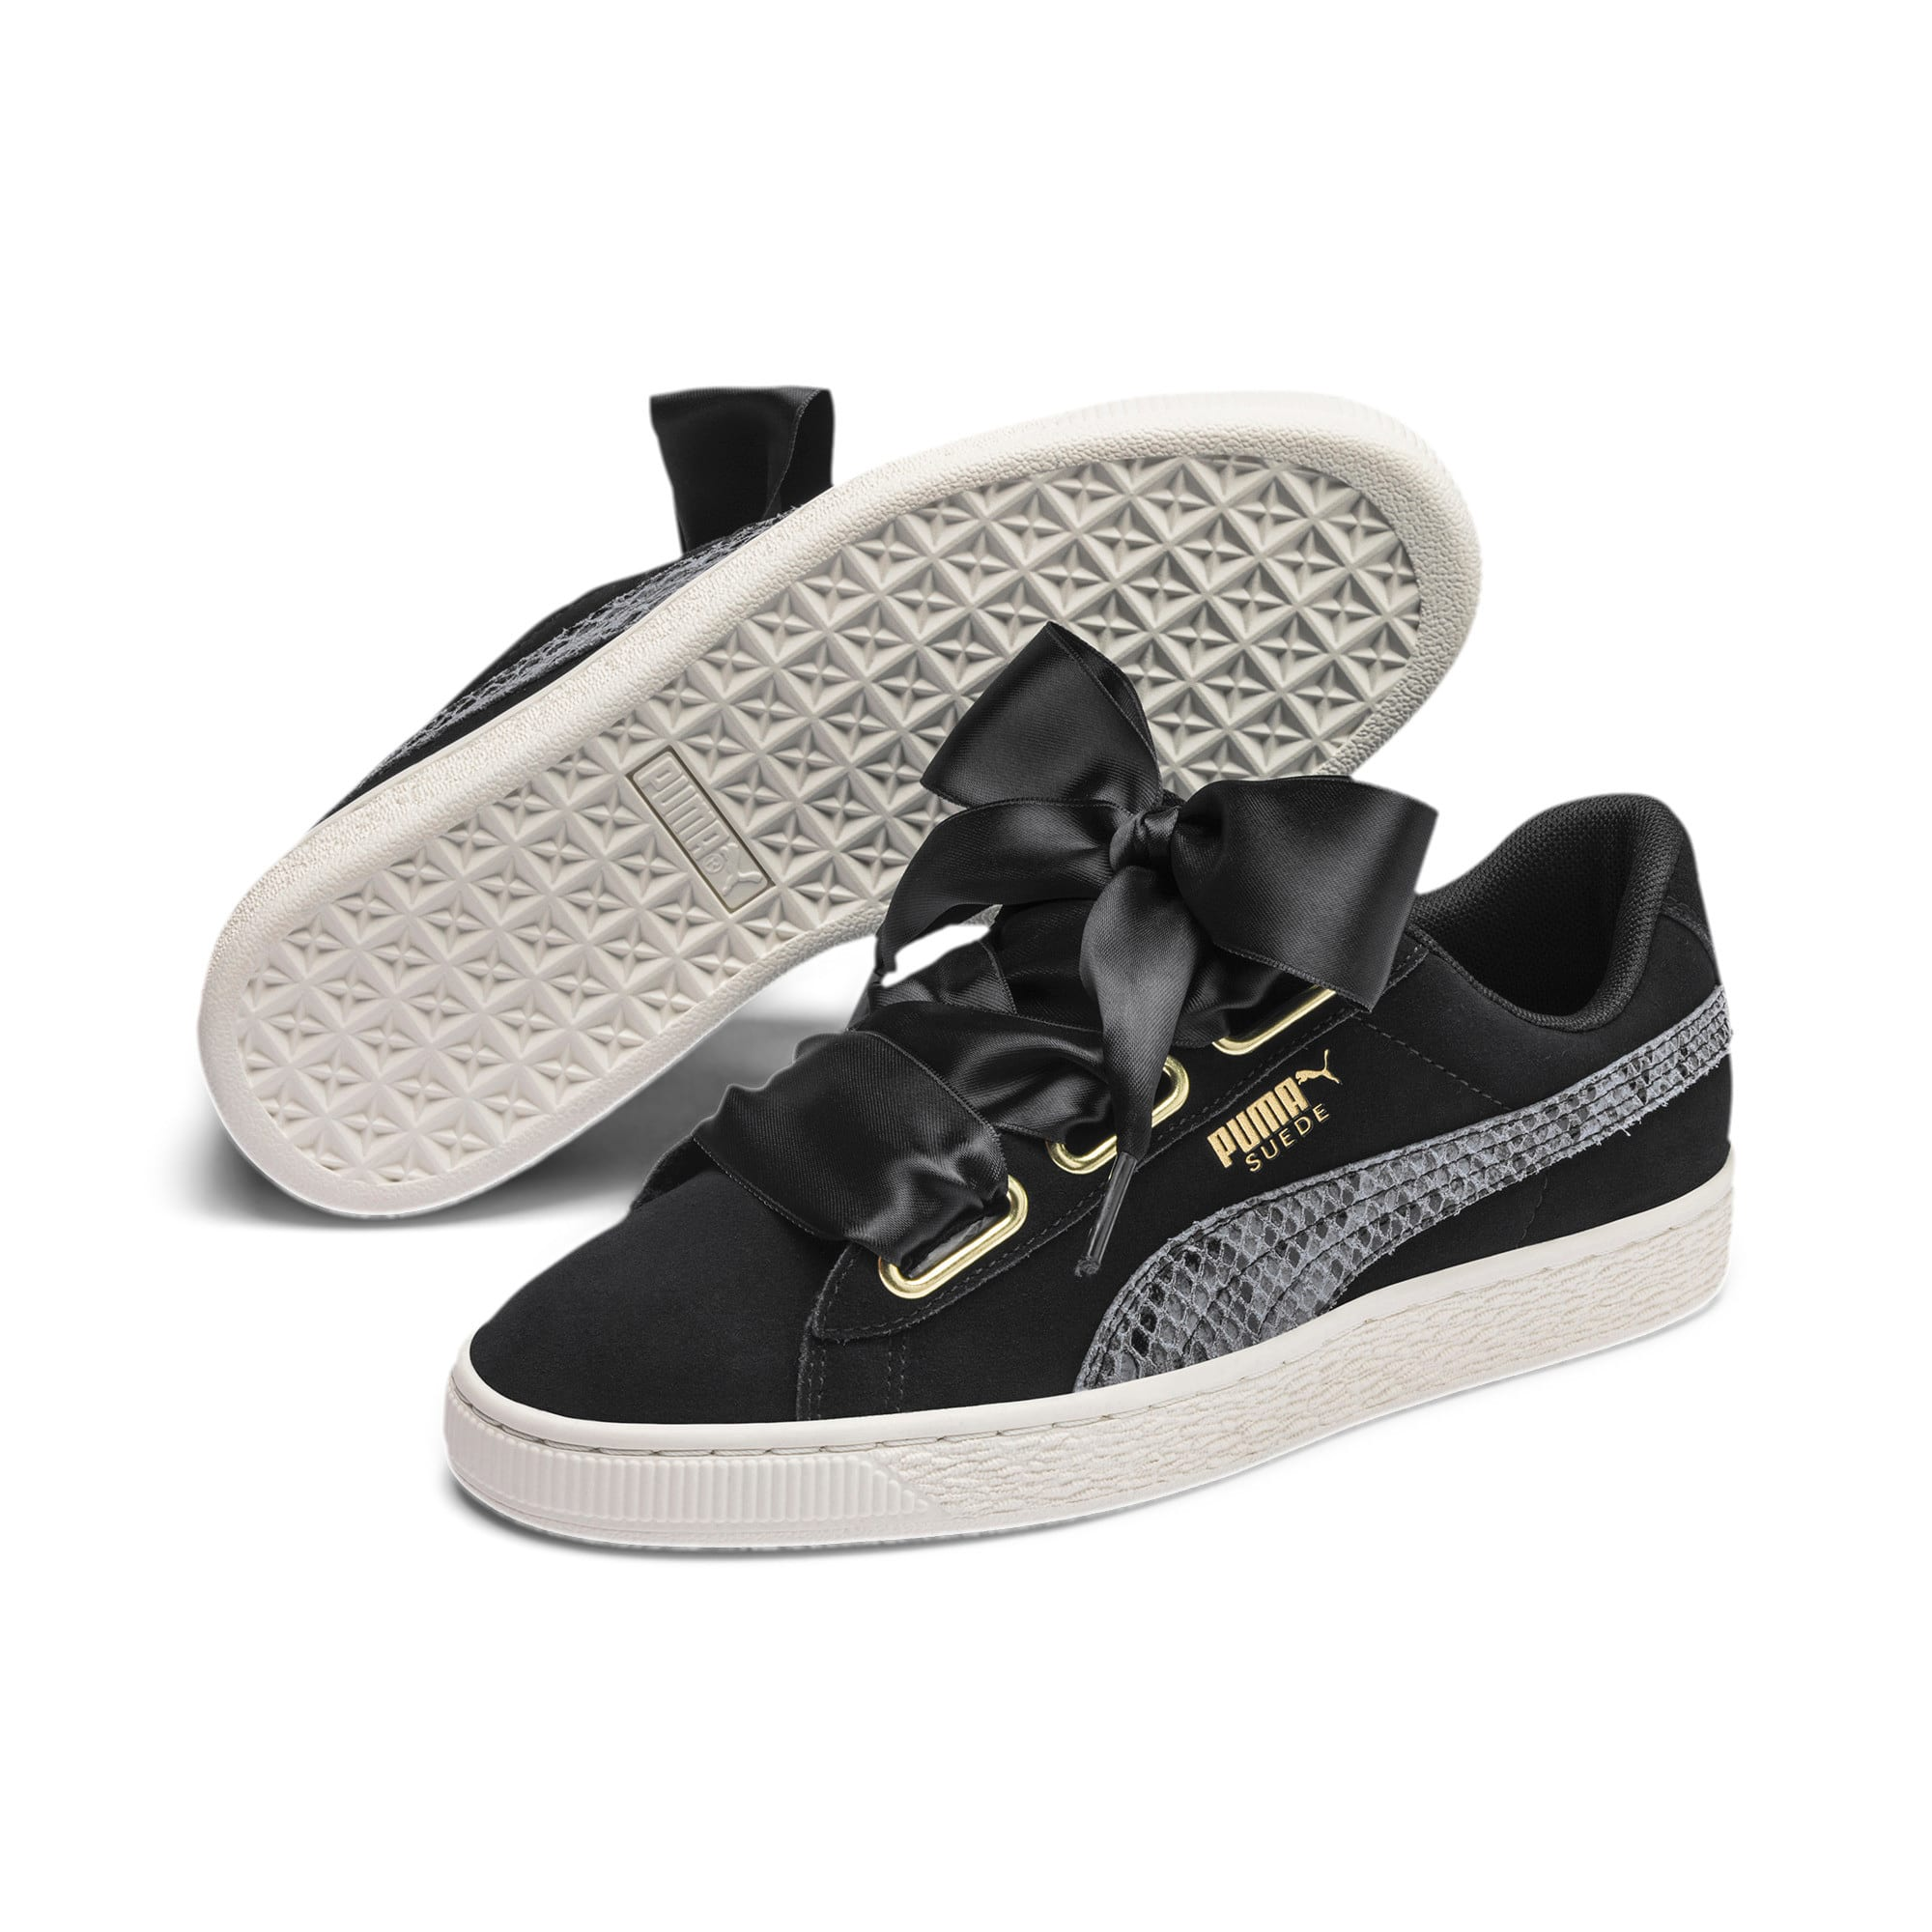 Thumbnail 3 of Suede Heart Snake Lux Women's Sneakers, Puma Black-Puma Team Gold, medium